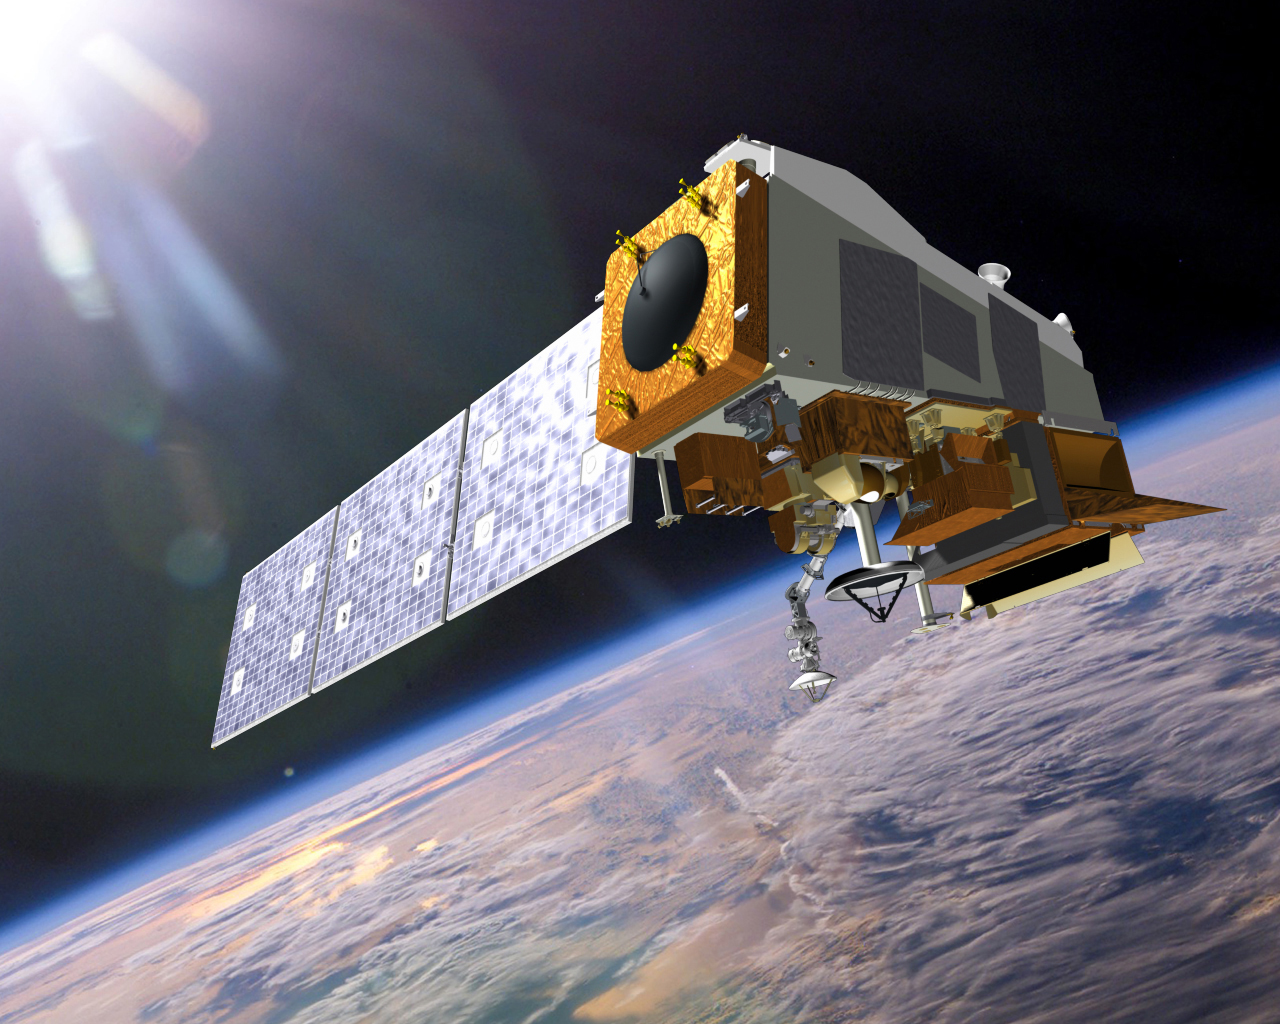 The Suomi NPP satellite. Image credit: NOAA